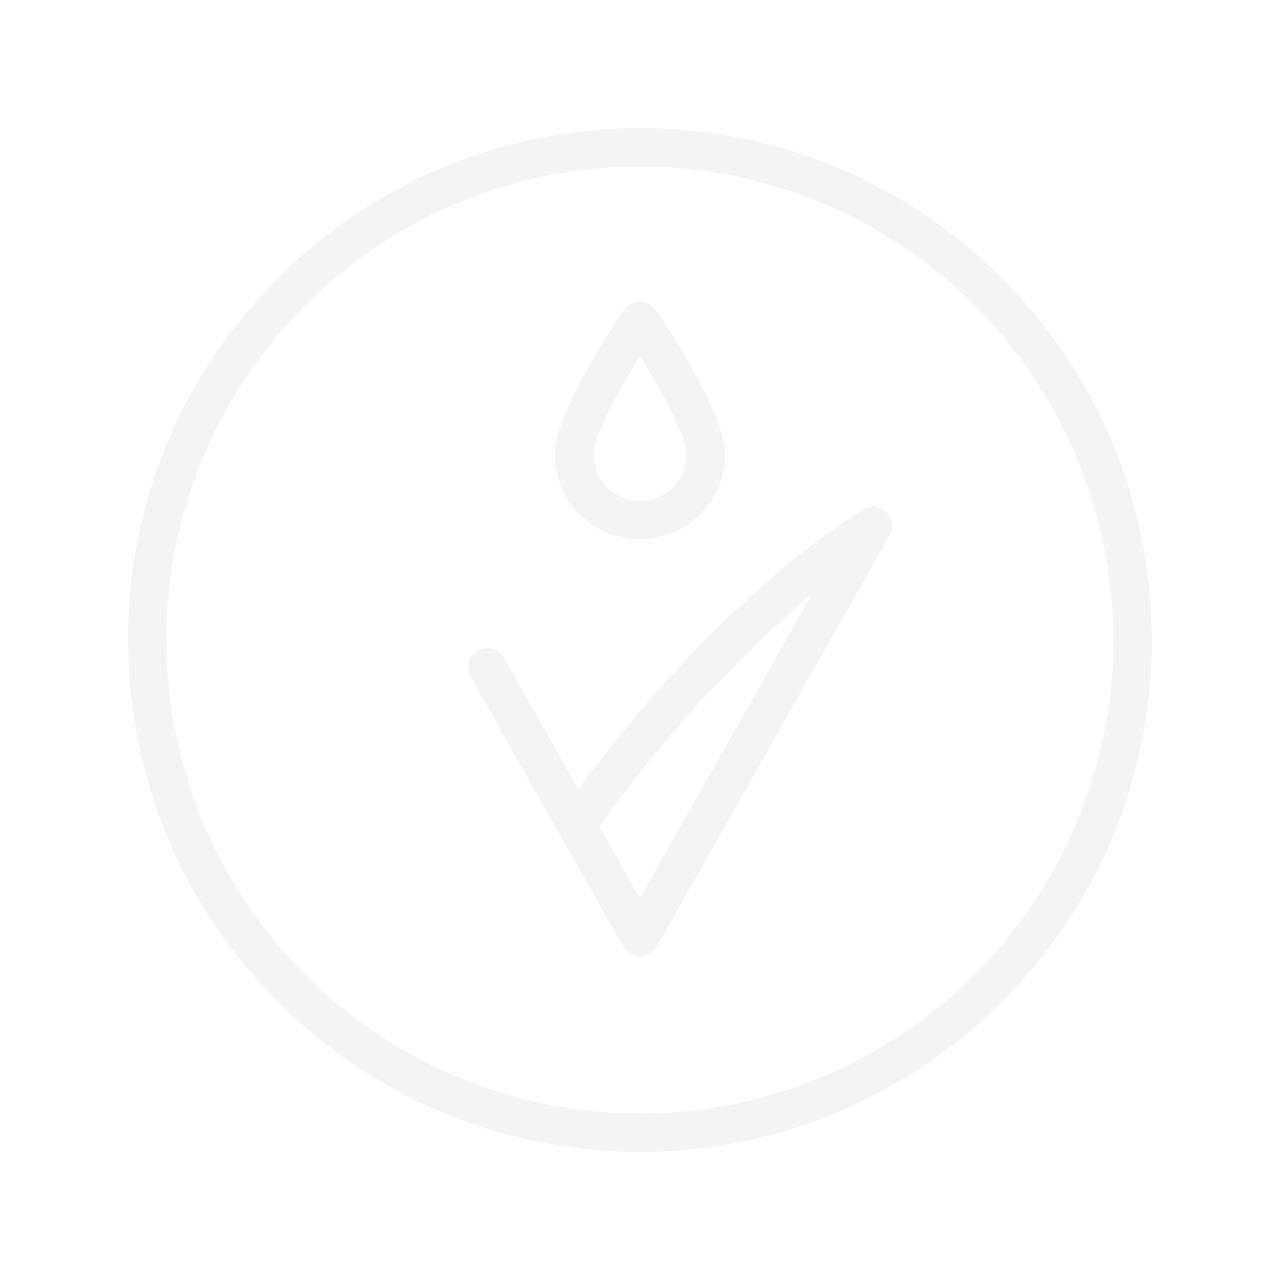 E.L.F. Blemish Control Face Primer Clear 14ml